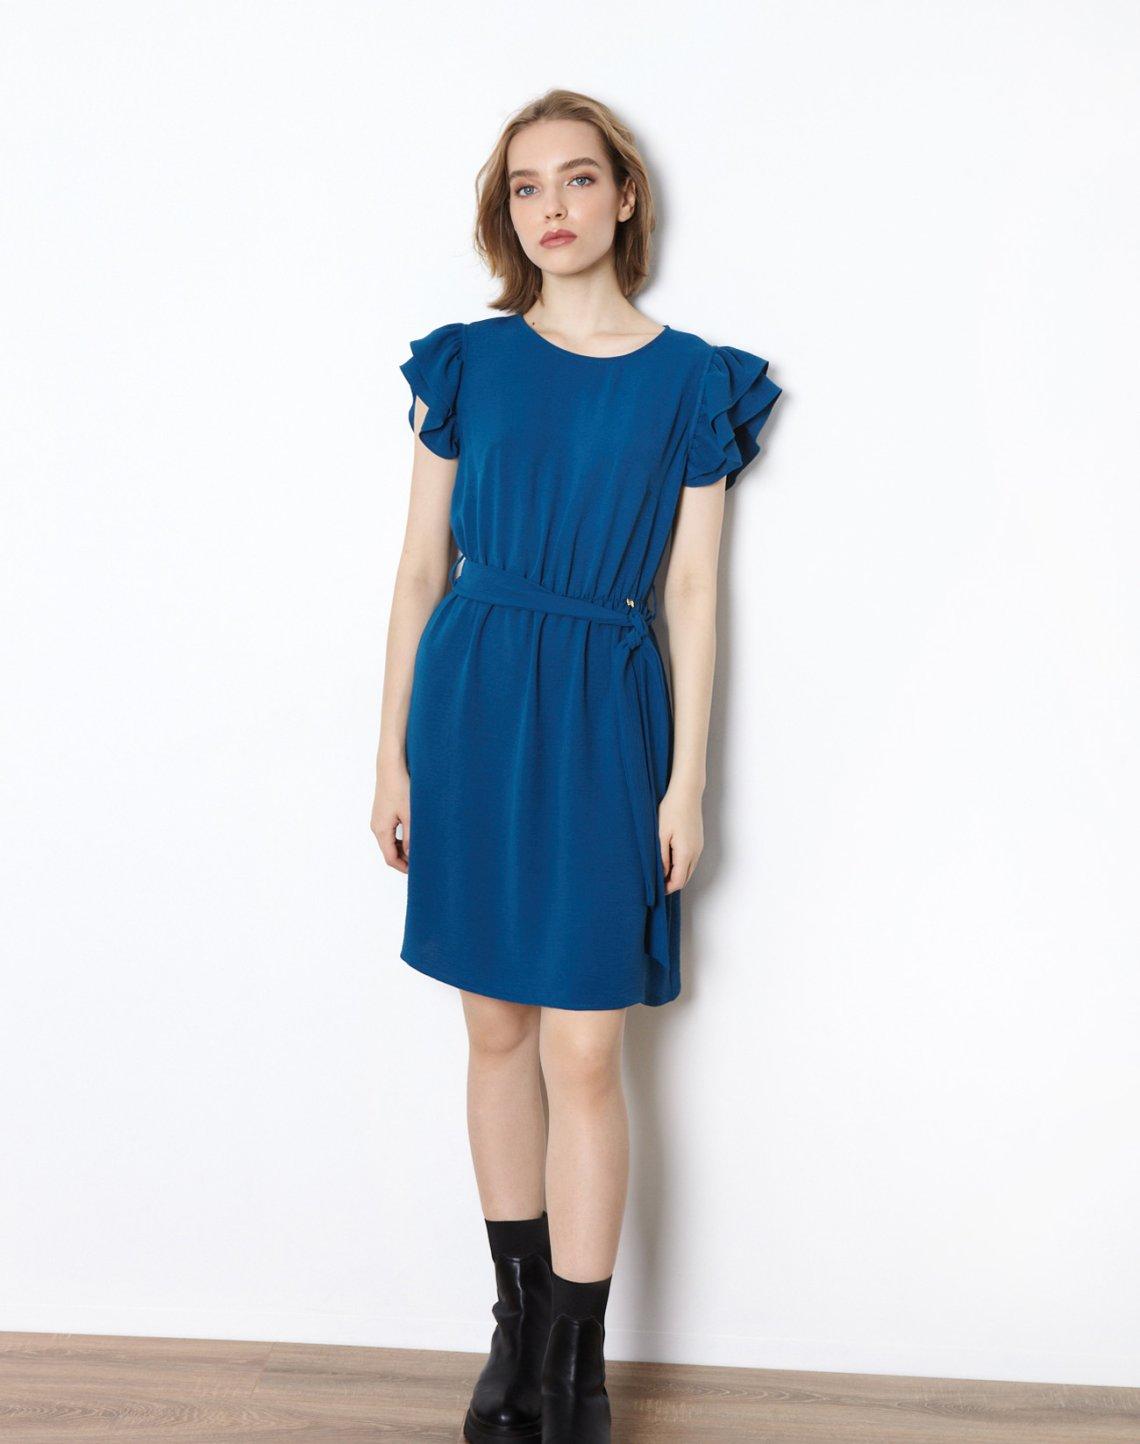 Mini dress with ruffles